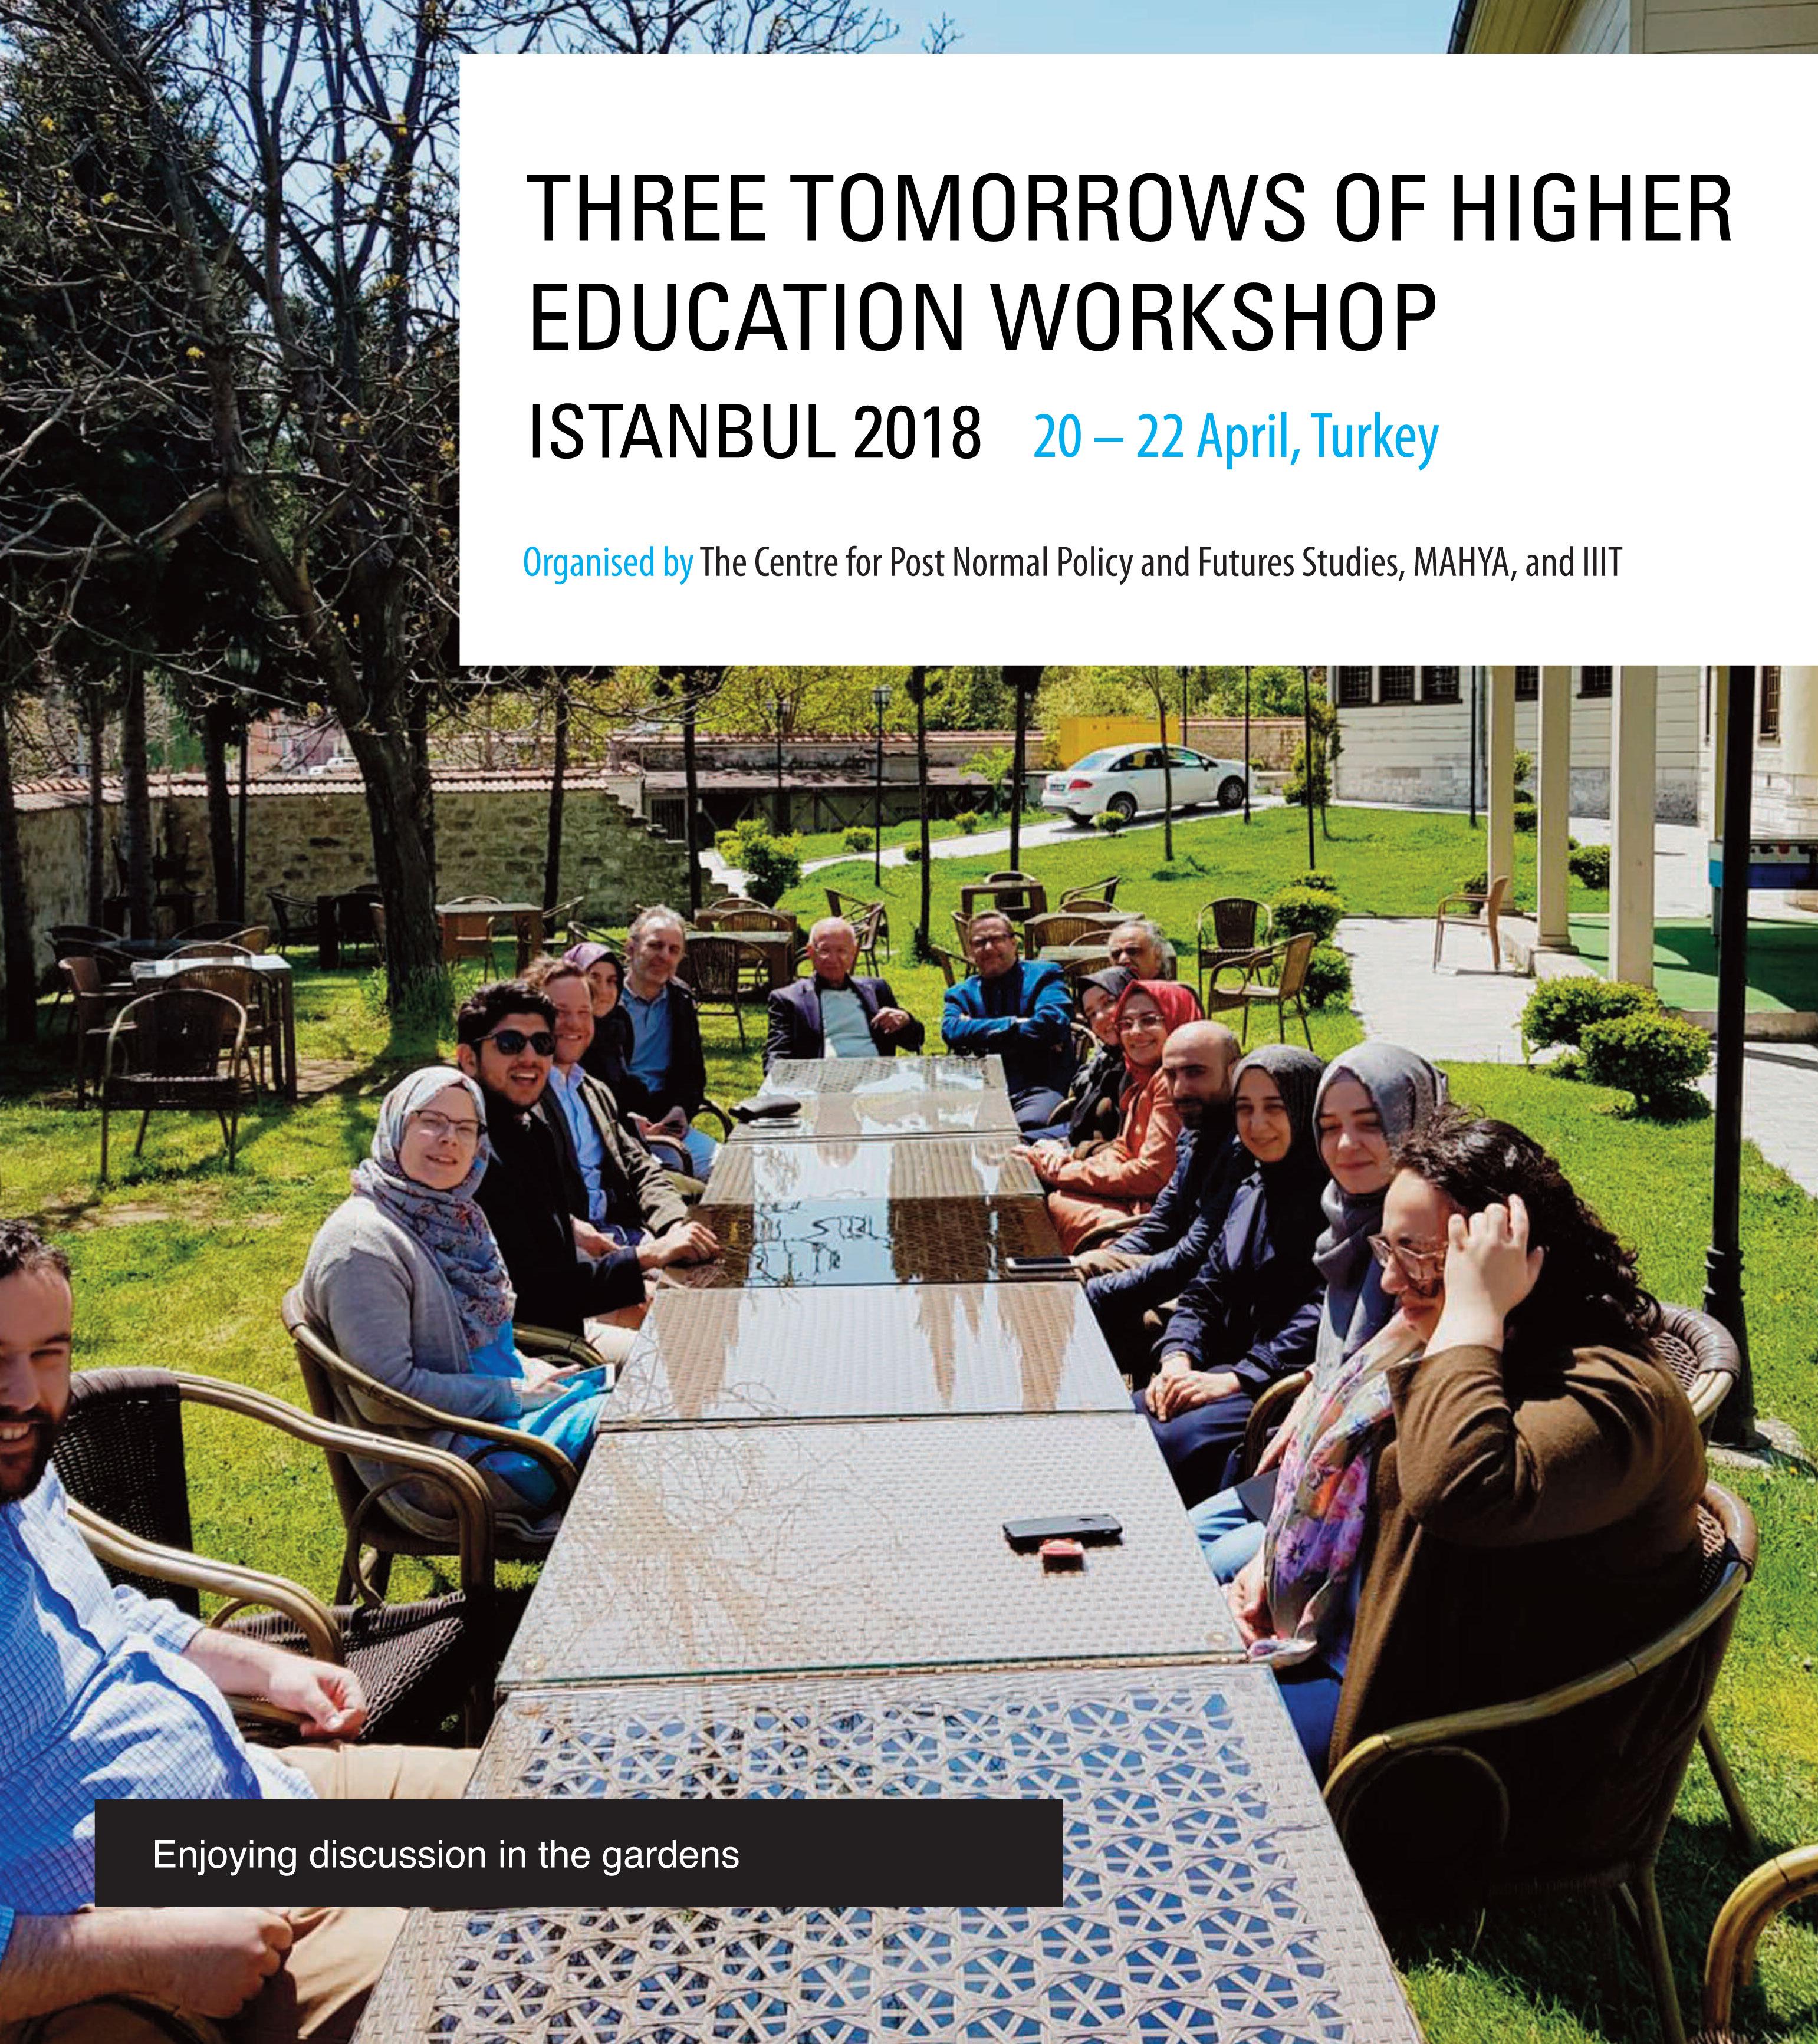 Three Tomorrows of Higher Education Workshop in Turkey